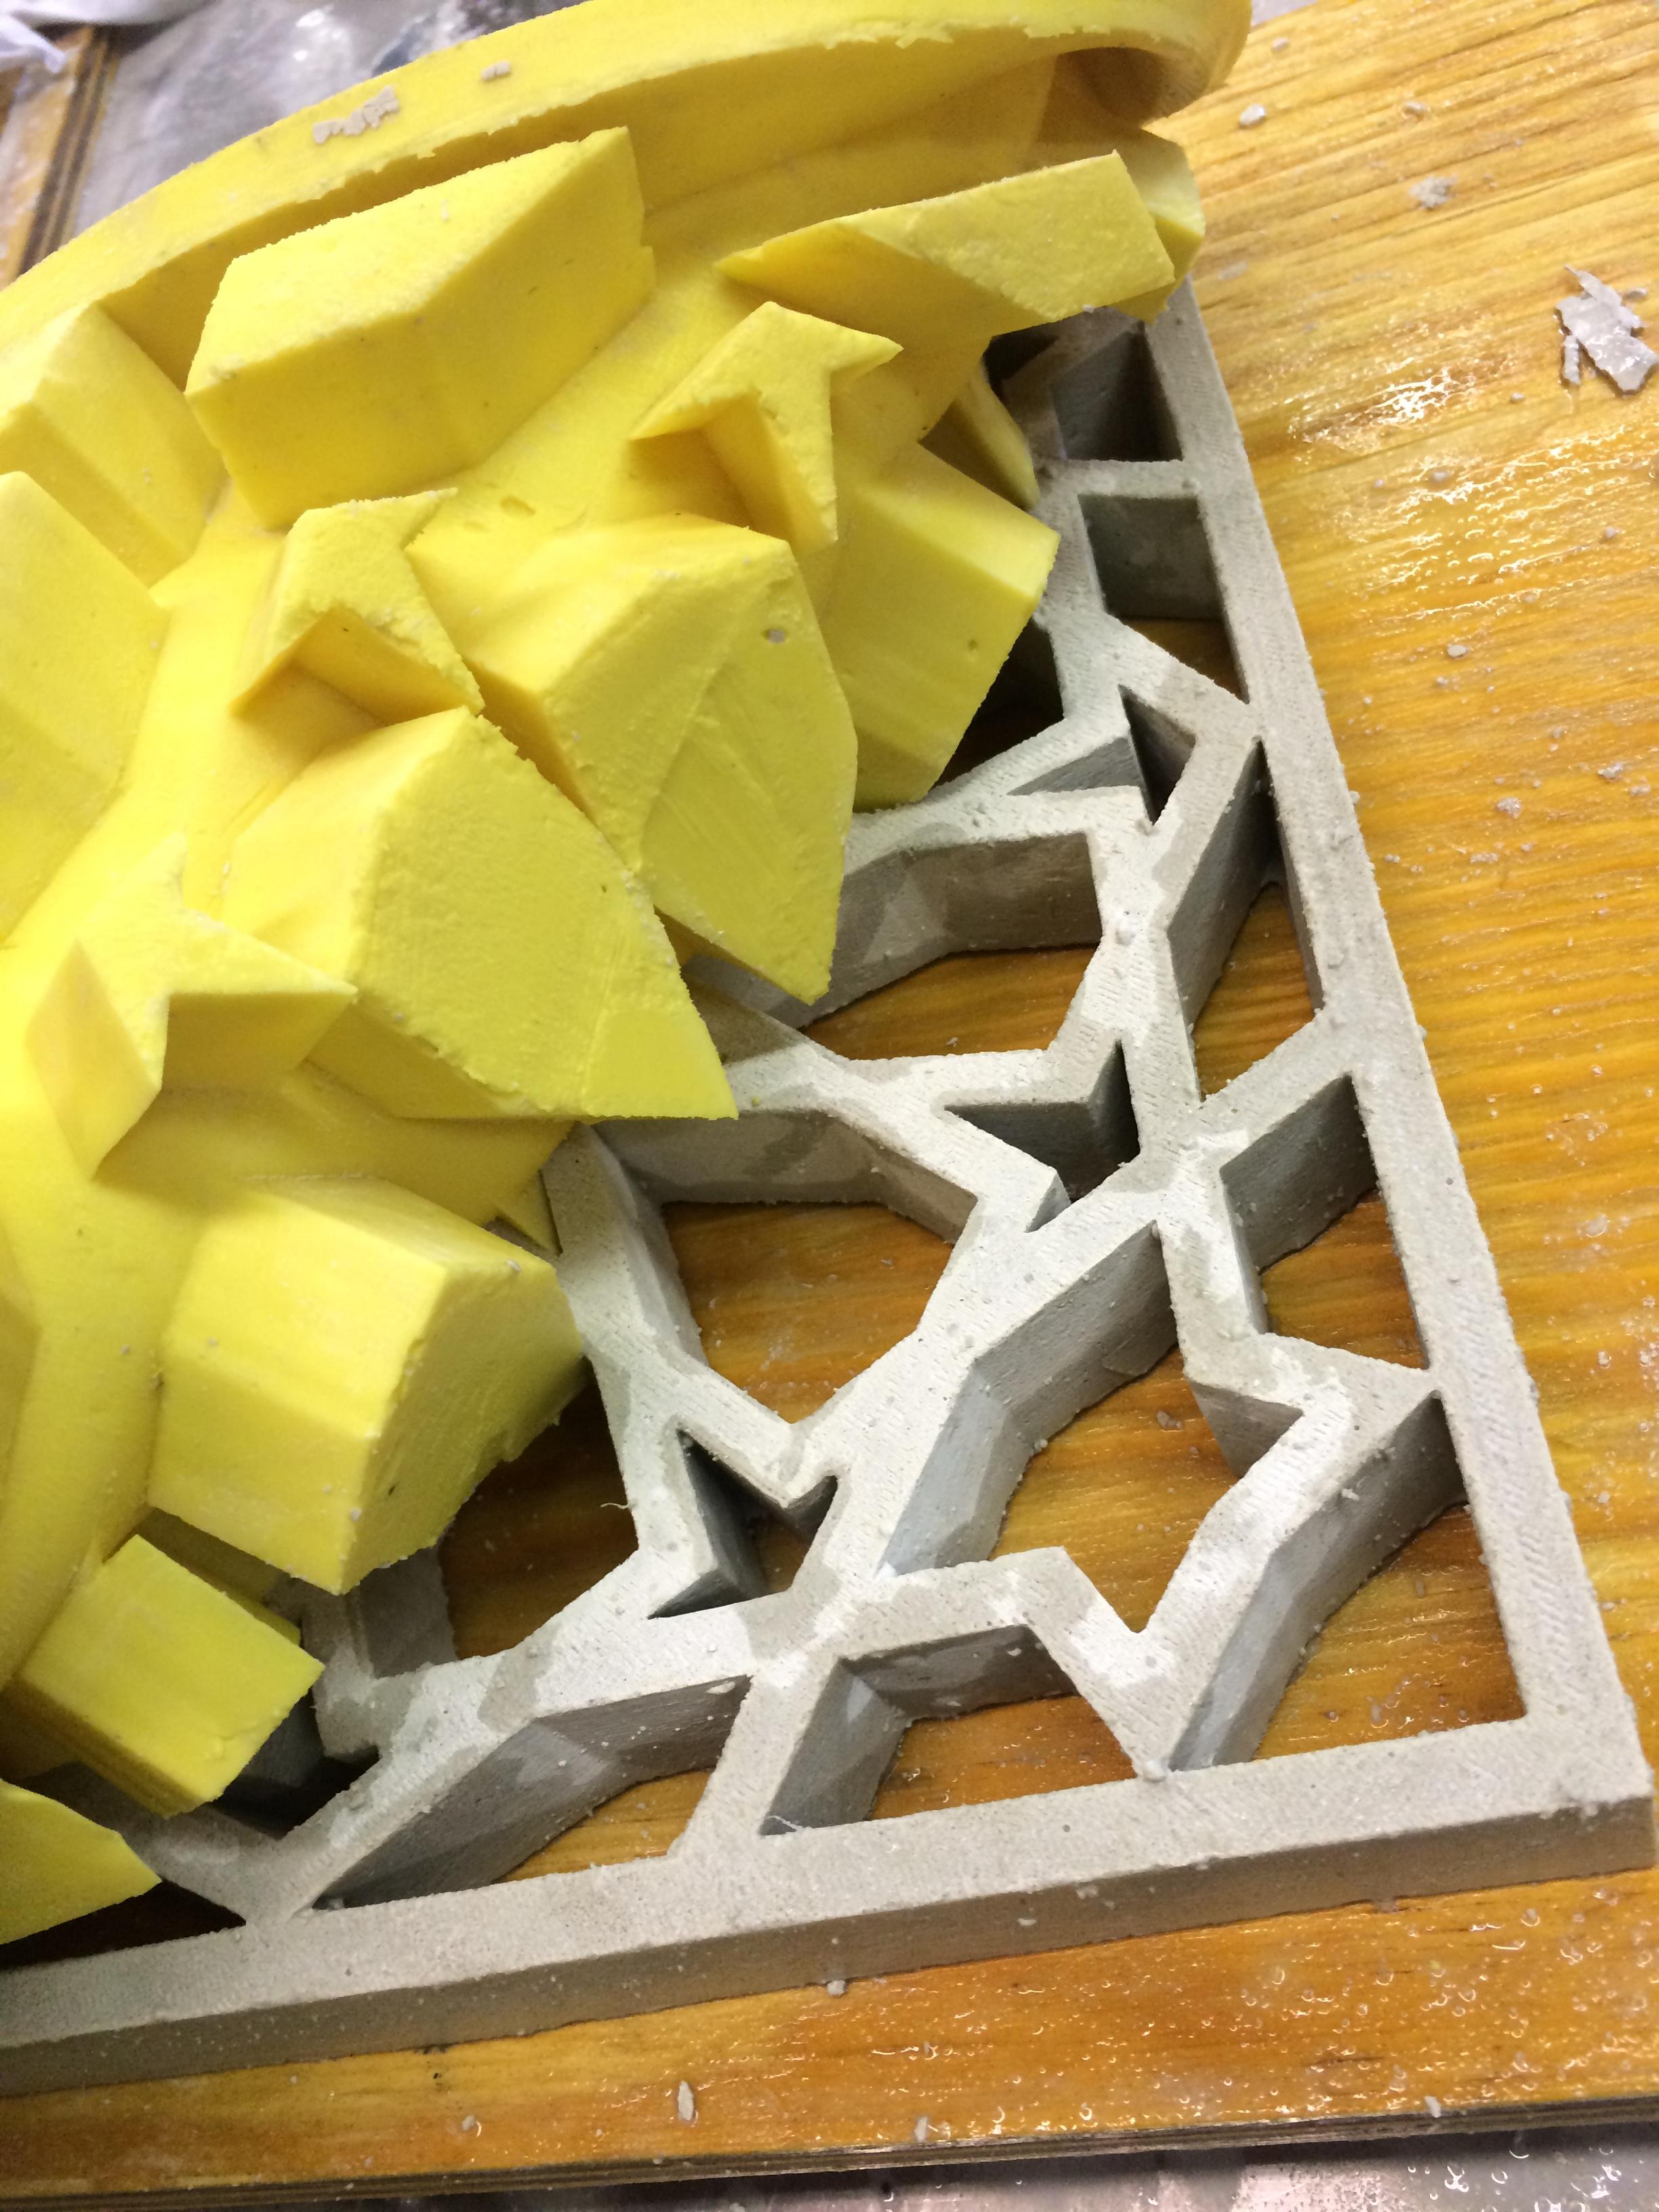 fabrication.jpg